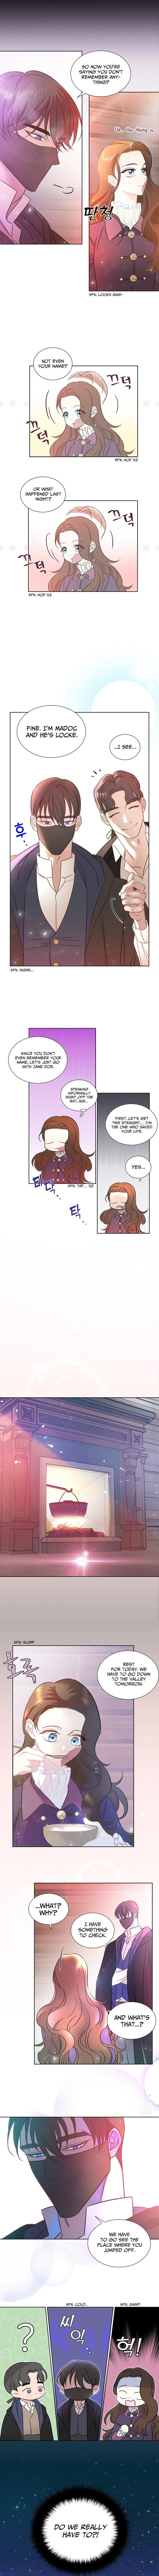 Manga The Princess' Spaceship - Chapter 4 Page 1